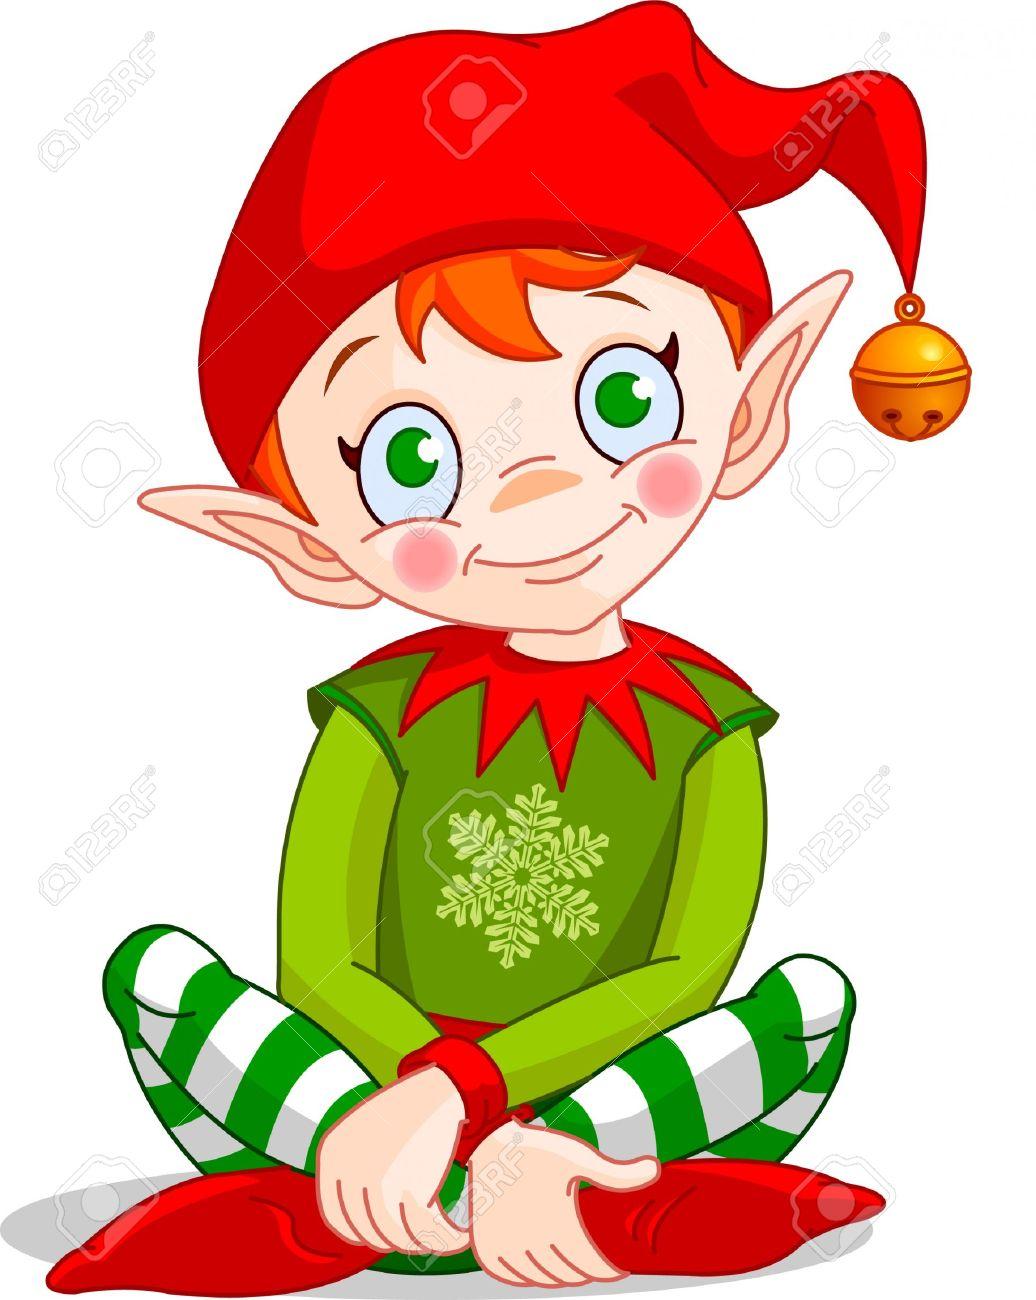 Sitting Christmas Elf Clipart #1